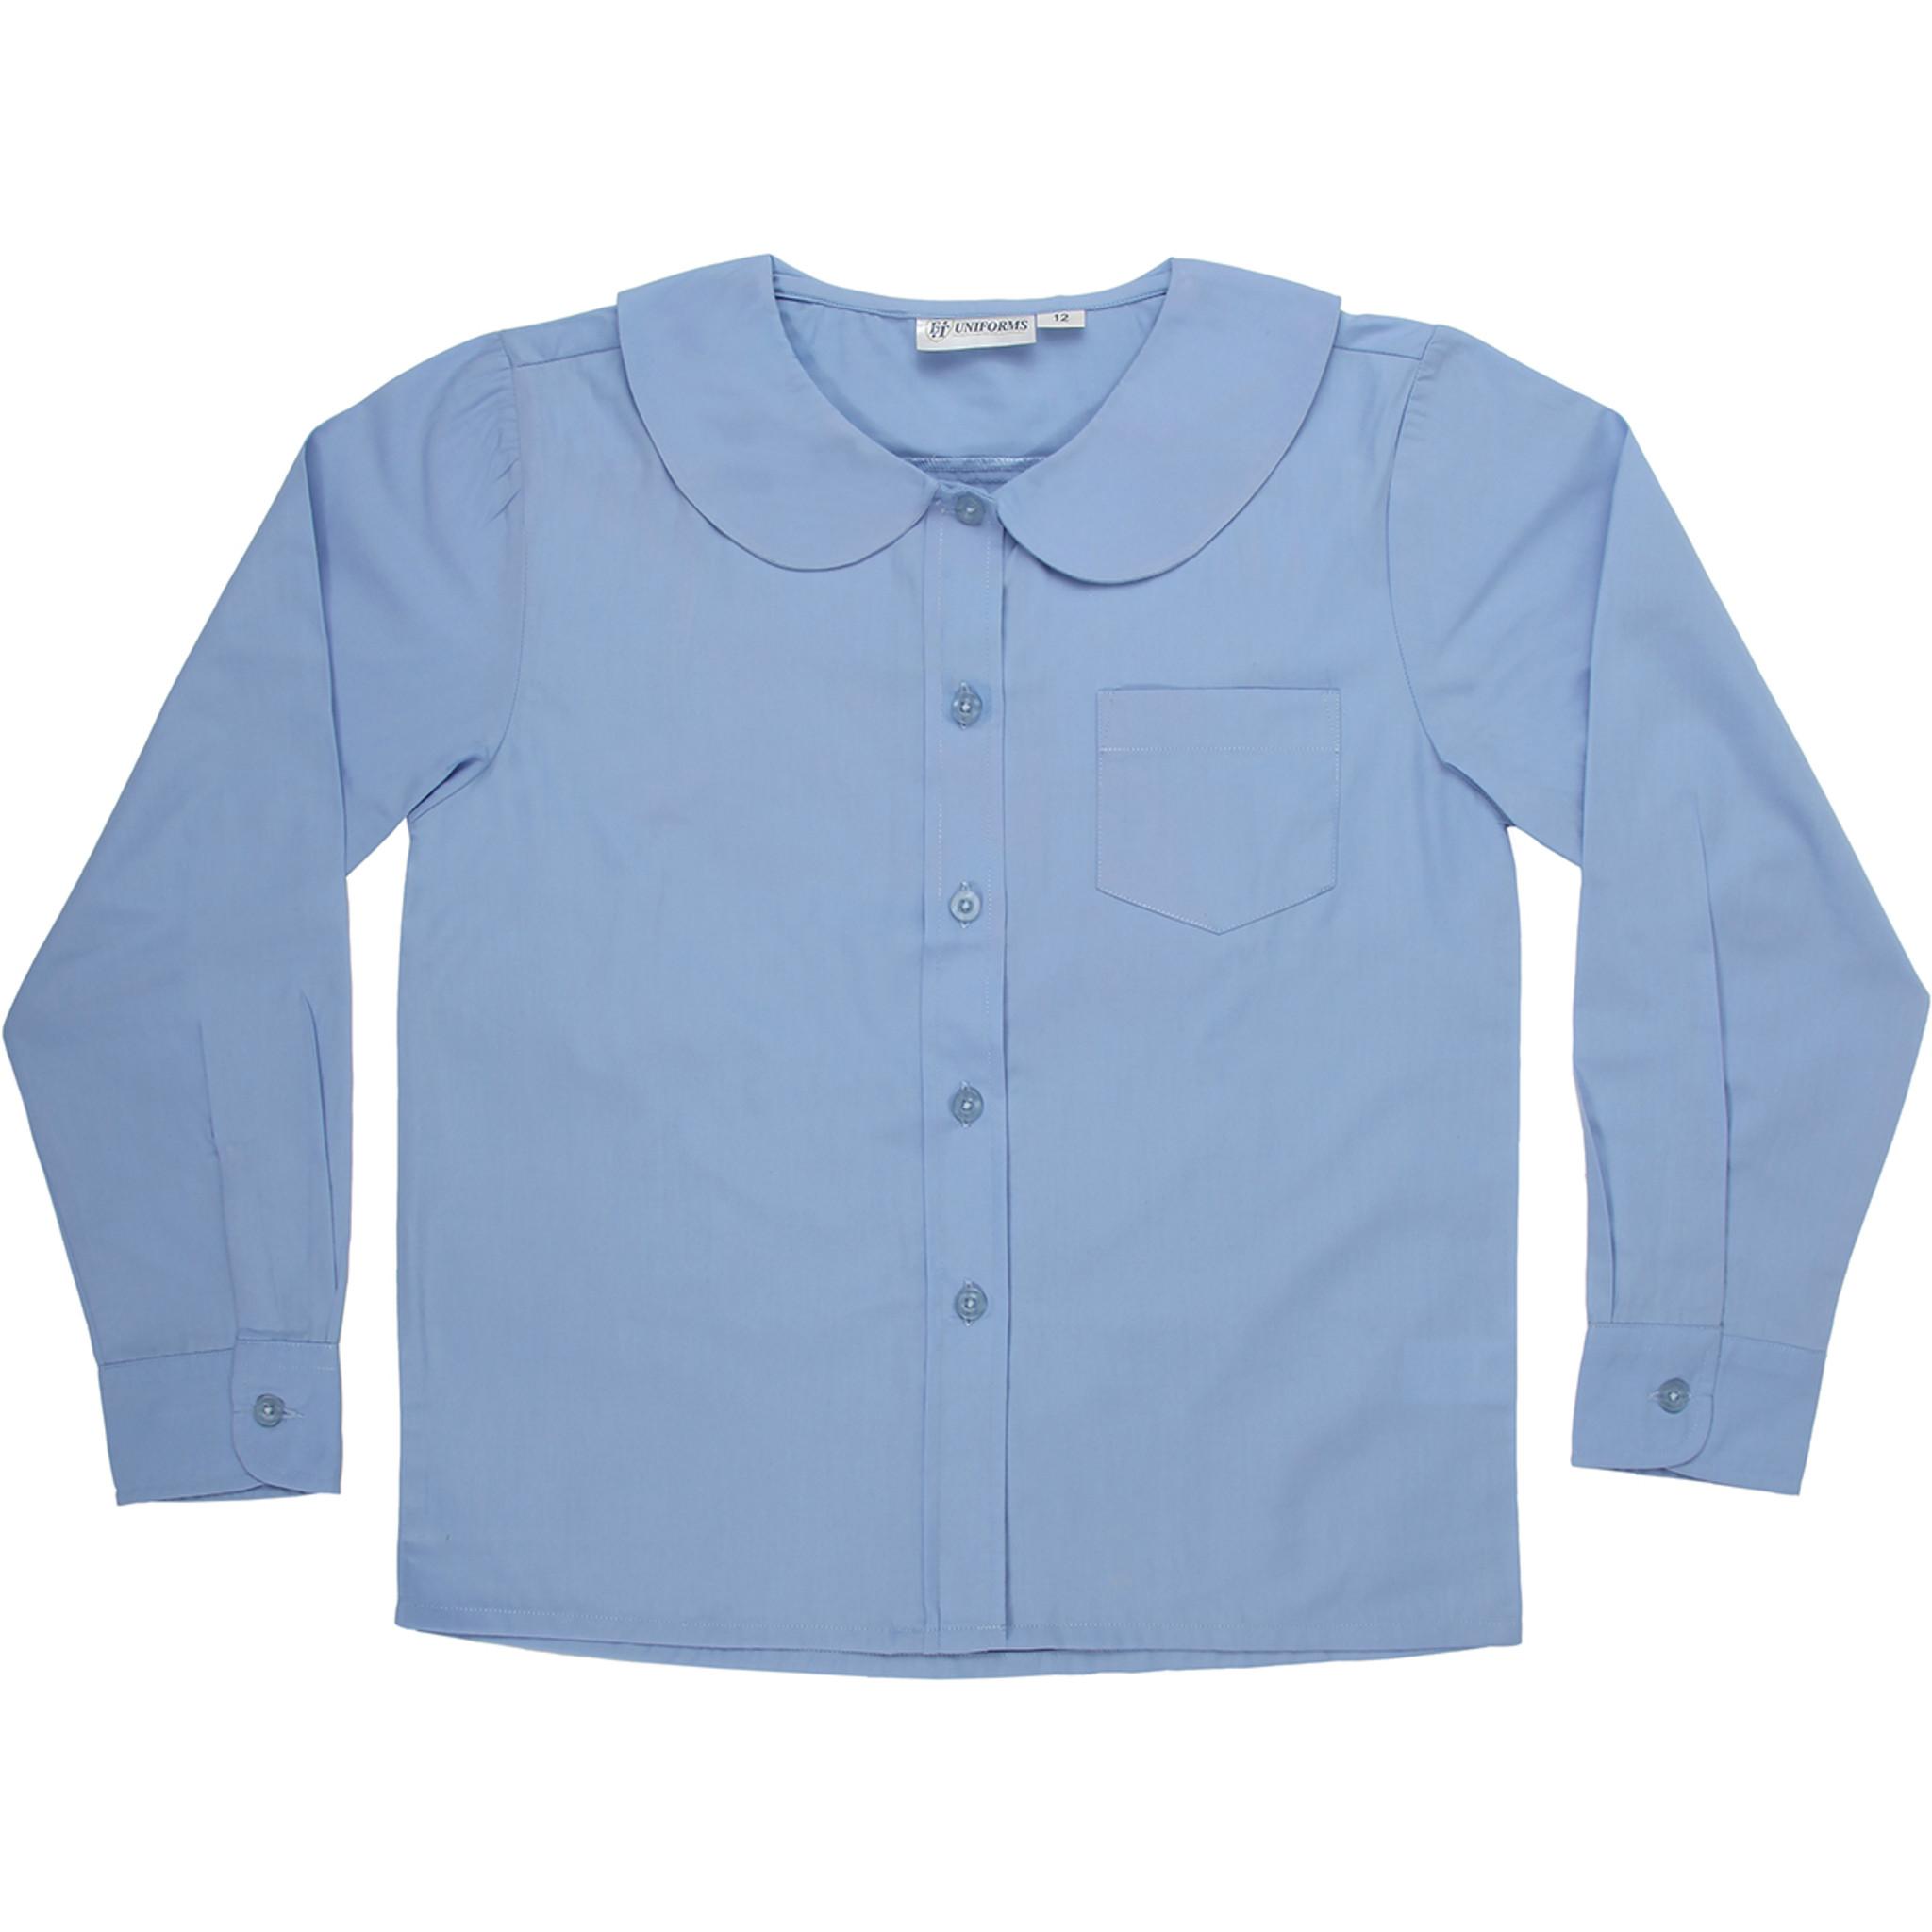 44502596b Girls Peter Pan Blouse Long Sleeve Color Blue - Engelic Uniforms